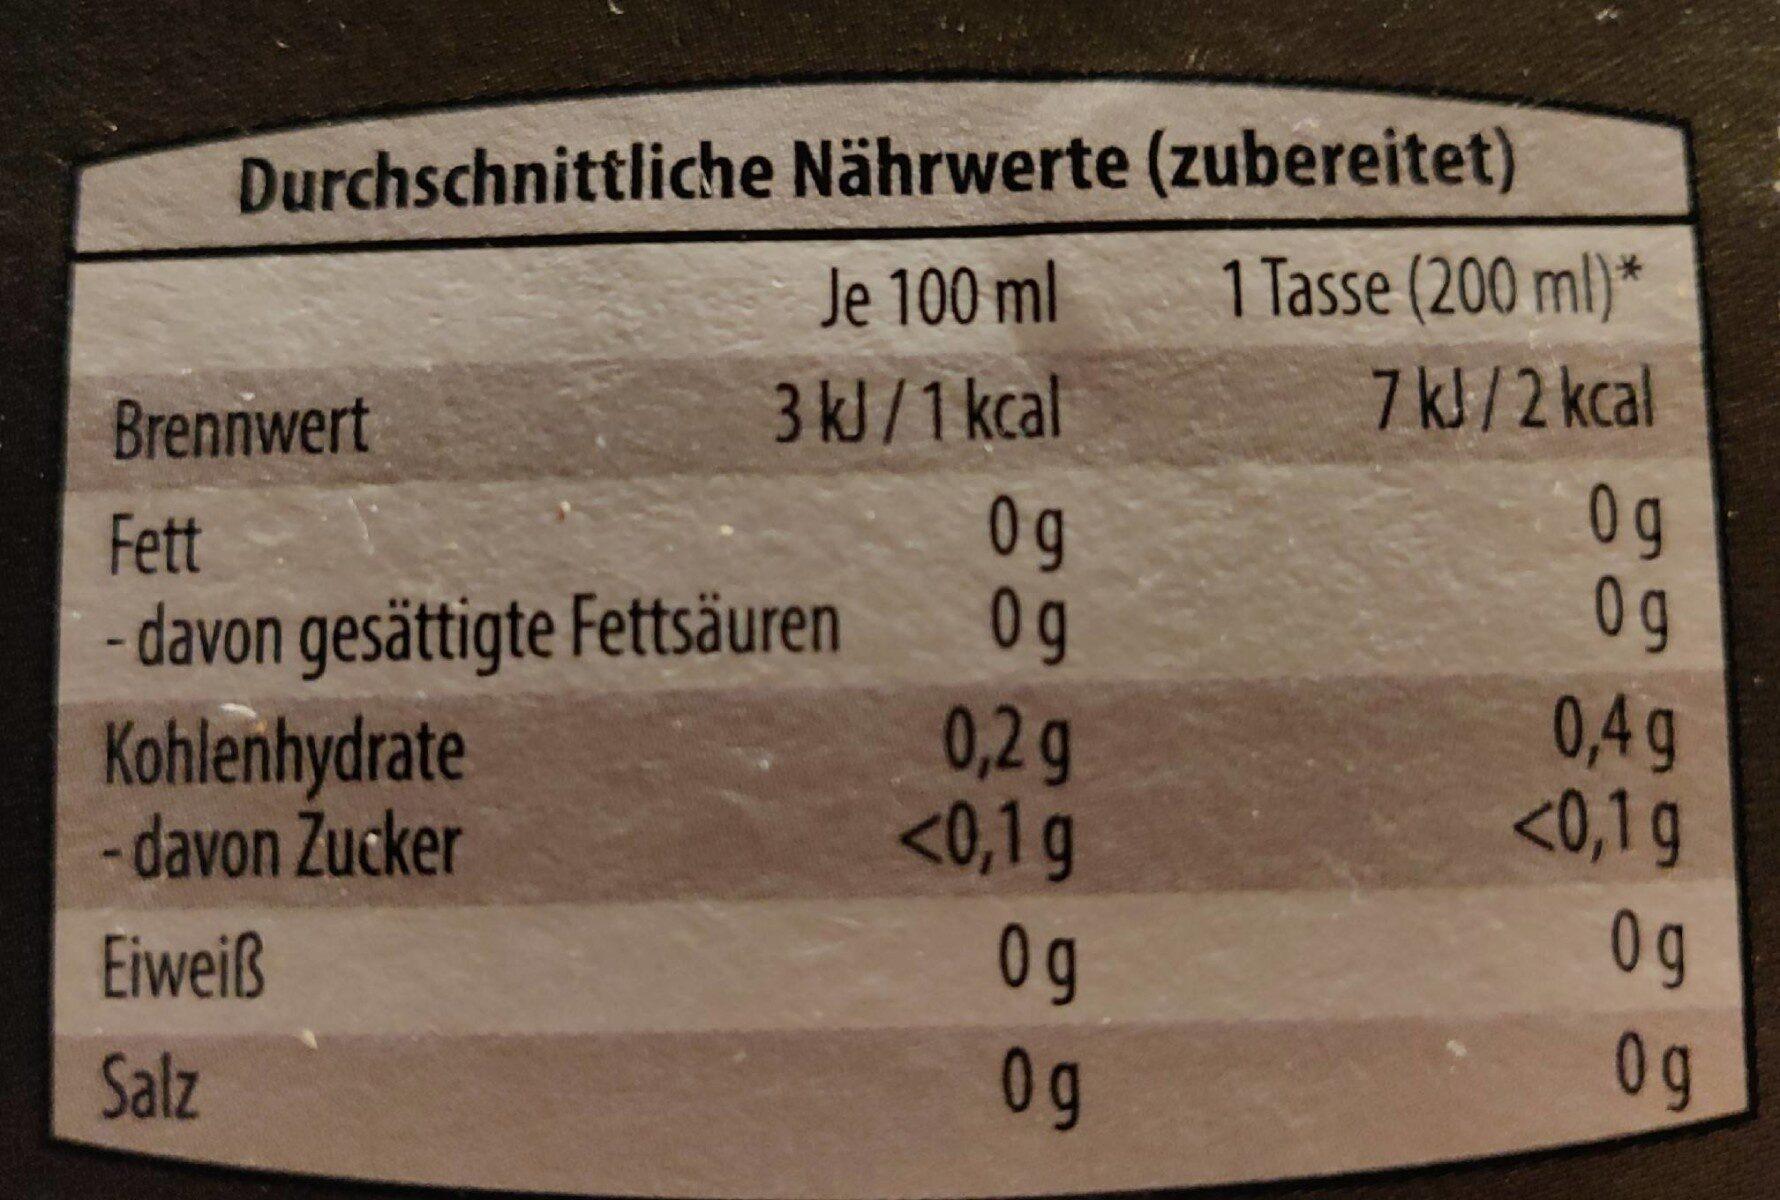 Westcliff Orientalische Minze - Nutrition facts - en